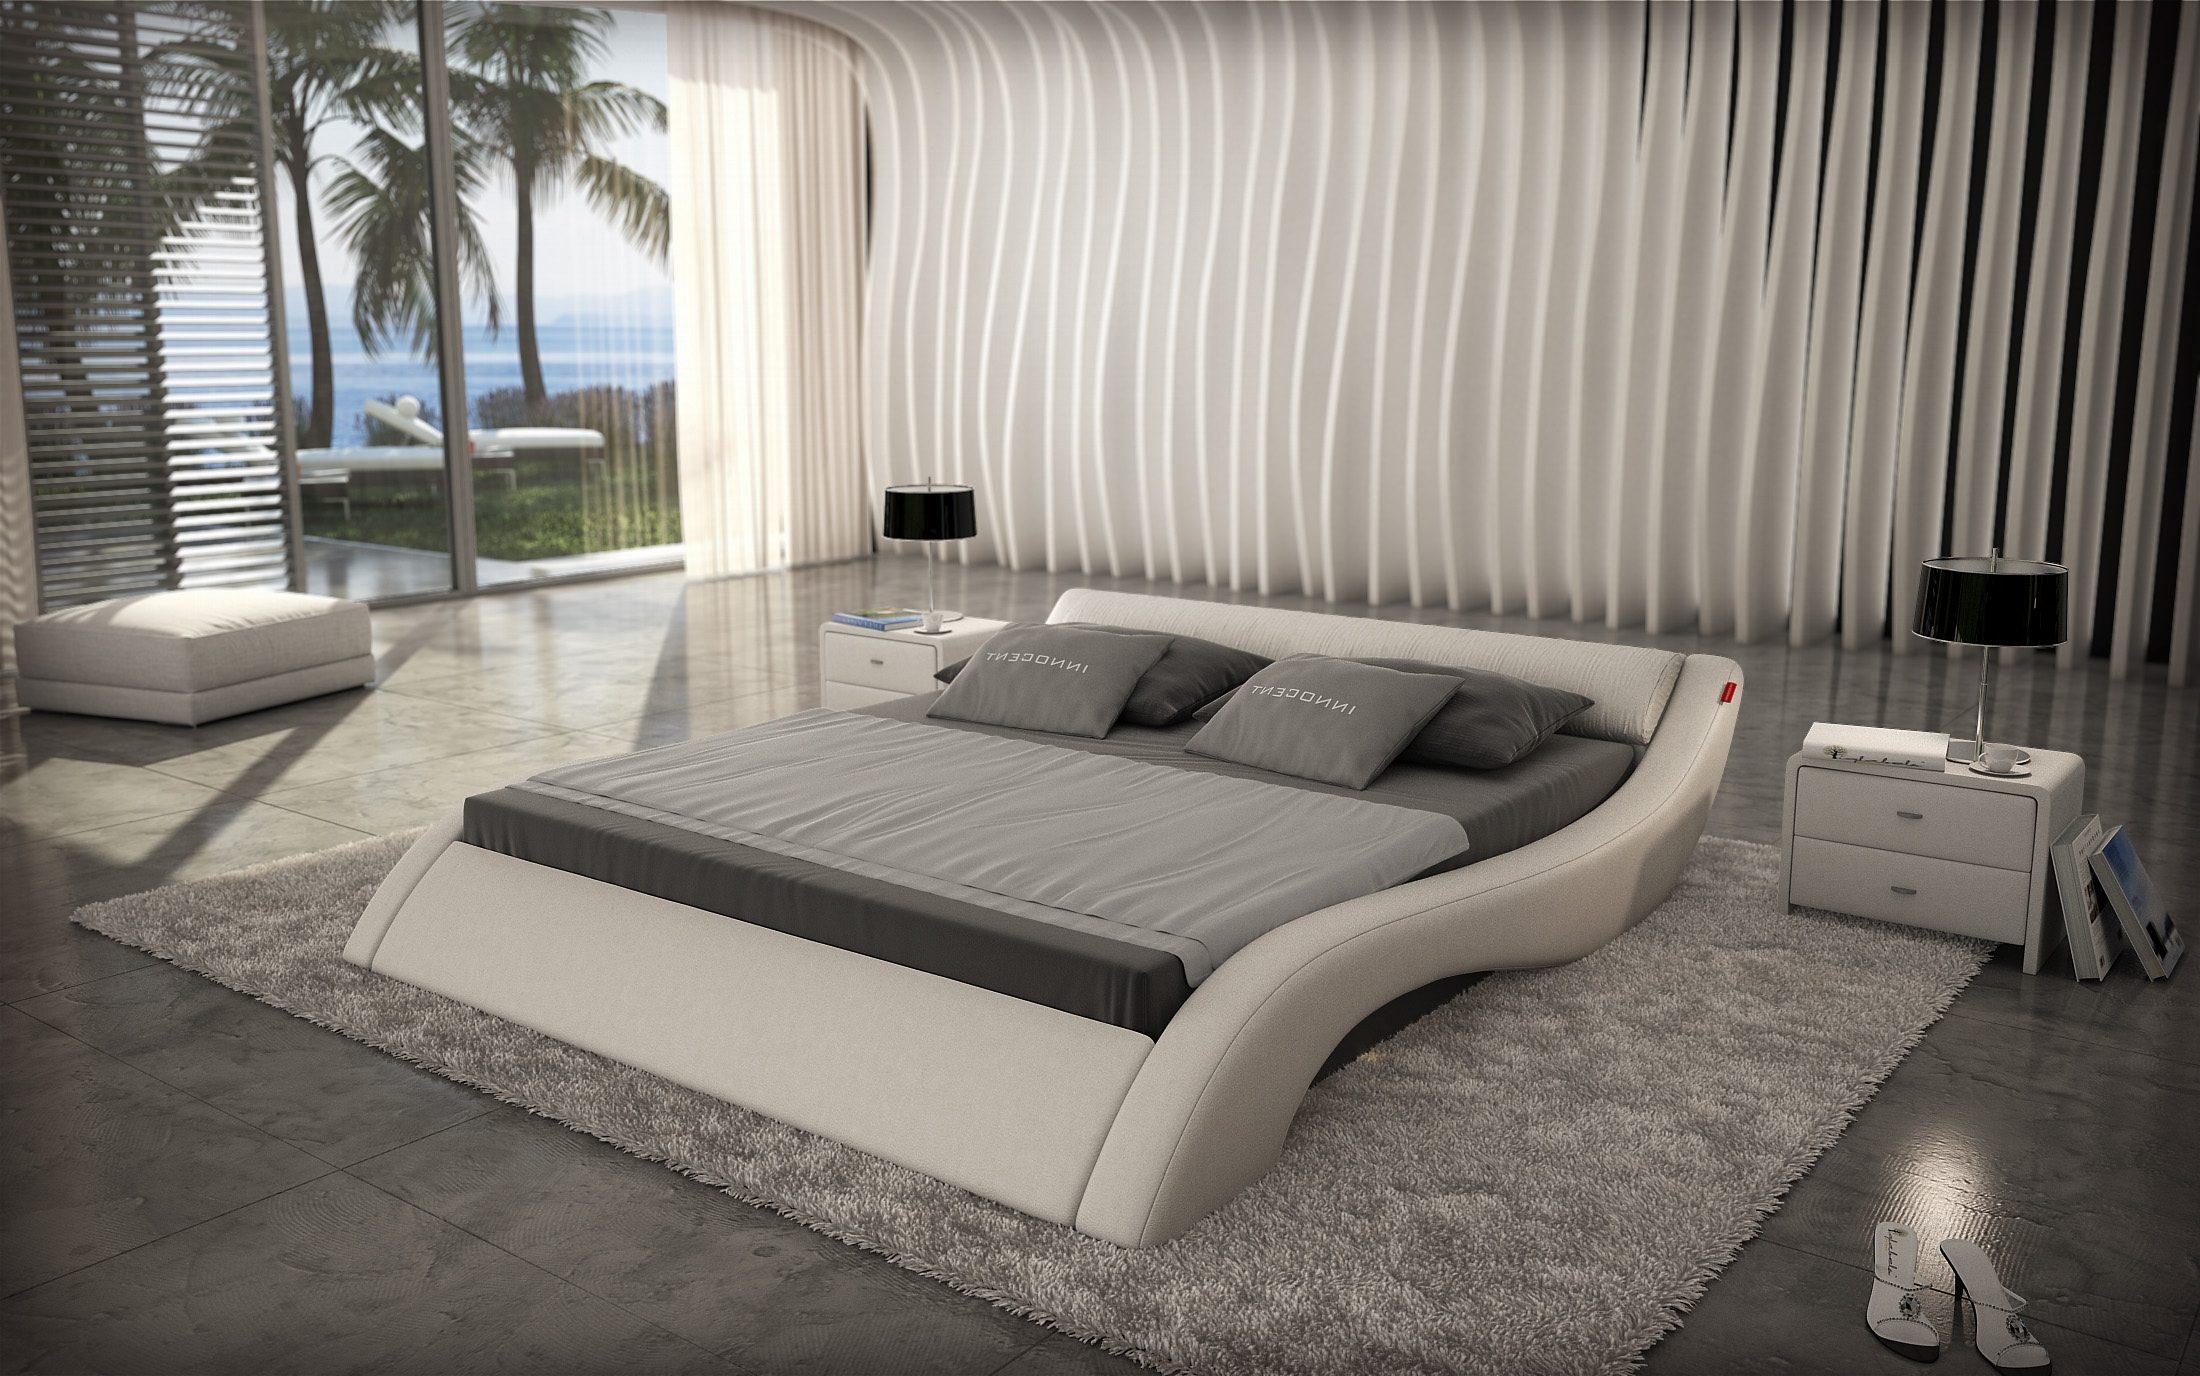 Innocent Polsterbett 180x200cm Designer Bett weiß »Avani«